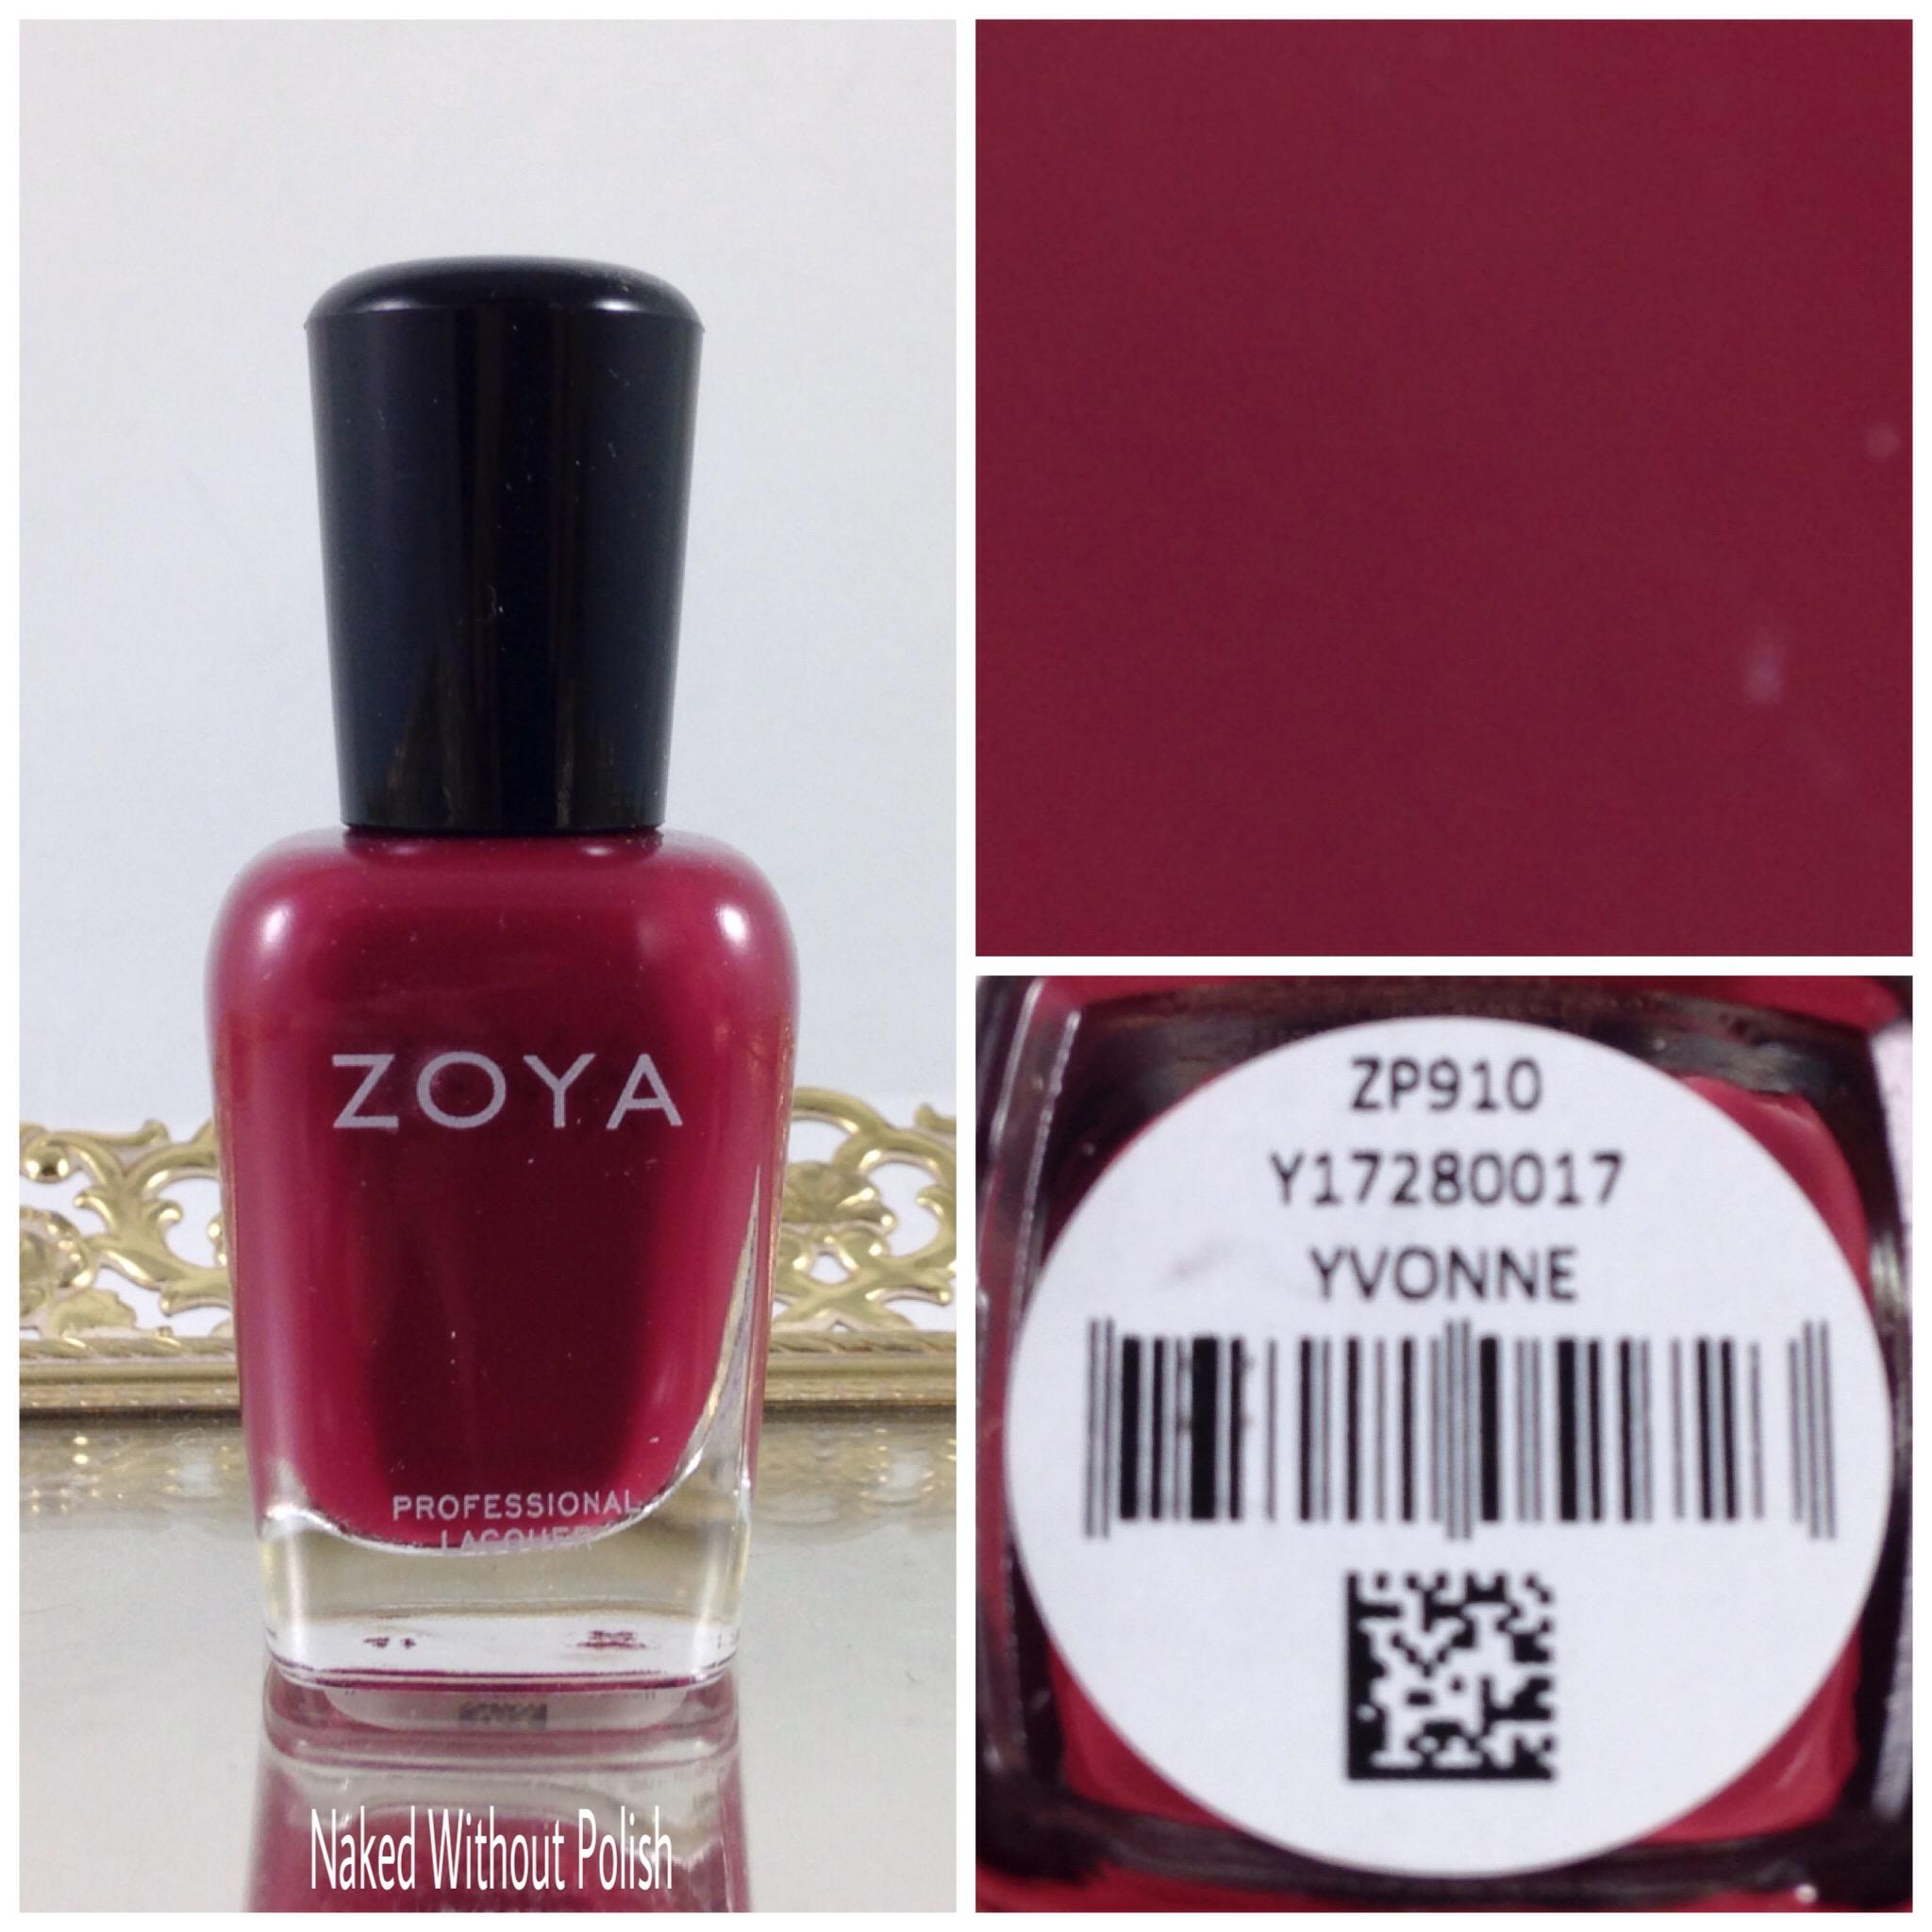 Zoya-Yvonne-1